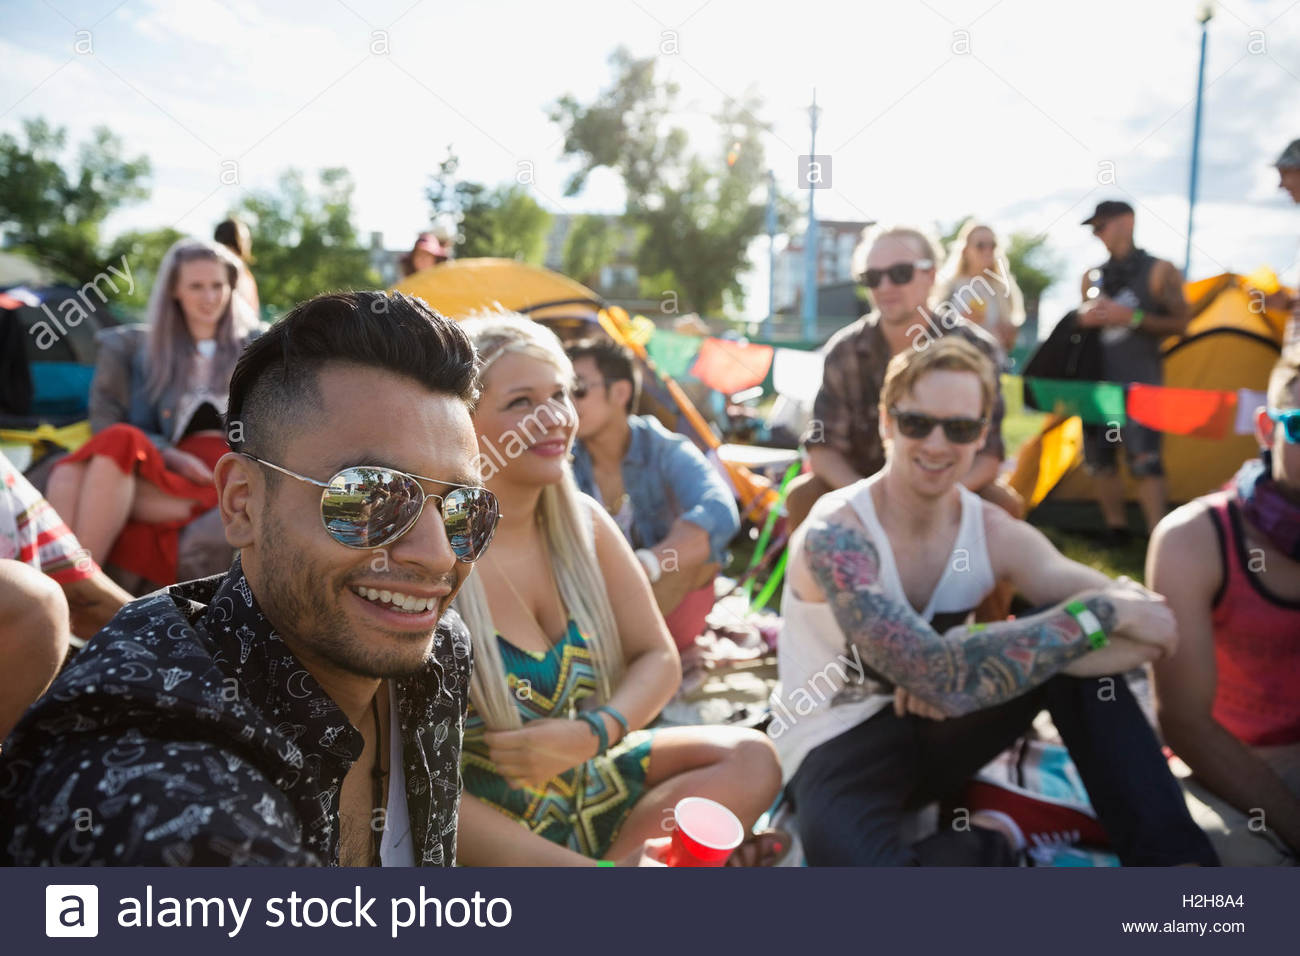 Portrait confident young men enjoying summer music festival - Stock Image